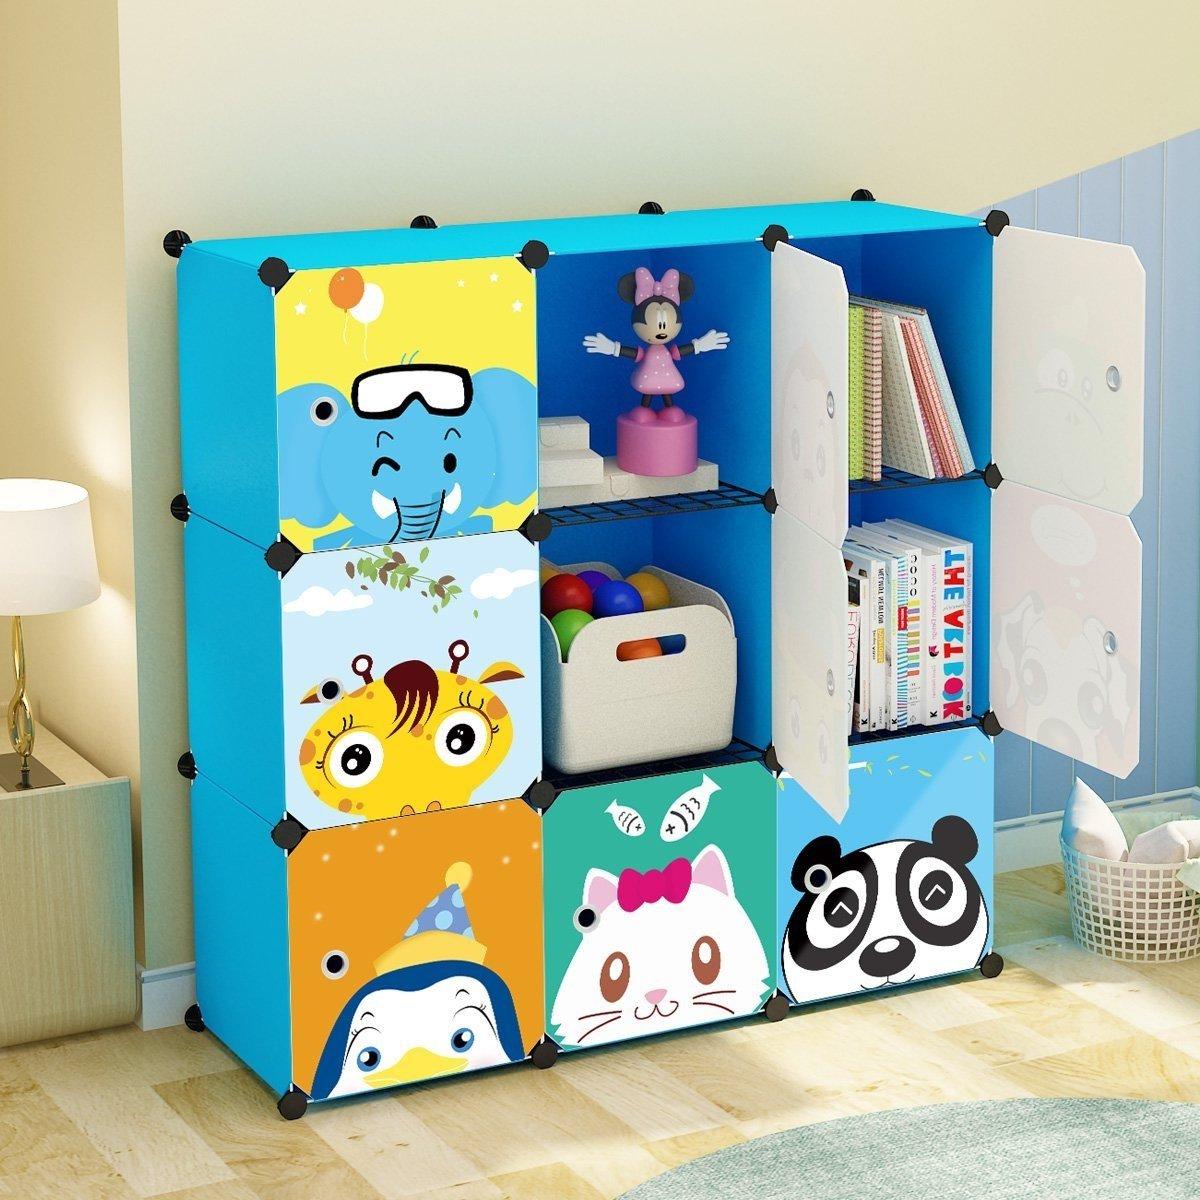 KOUSI Portable Kids Bookshelf Children Toy Organizer Multifuncation Cube Storage Shelf Cabinet Bookcase, Capacious & Study, Blue:9 Cubes